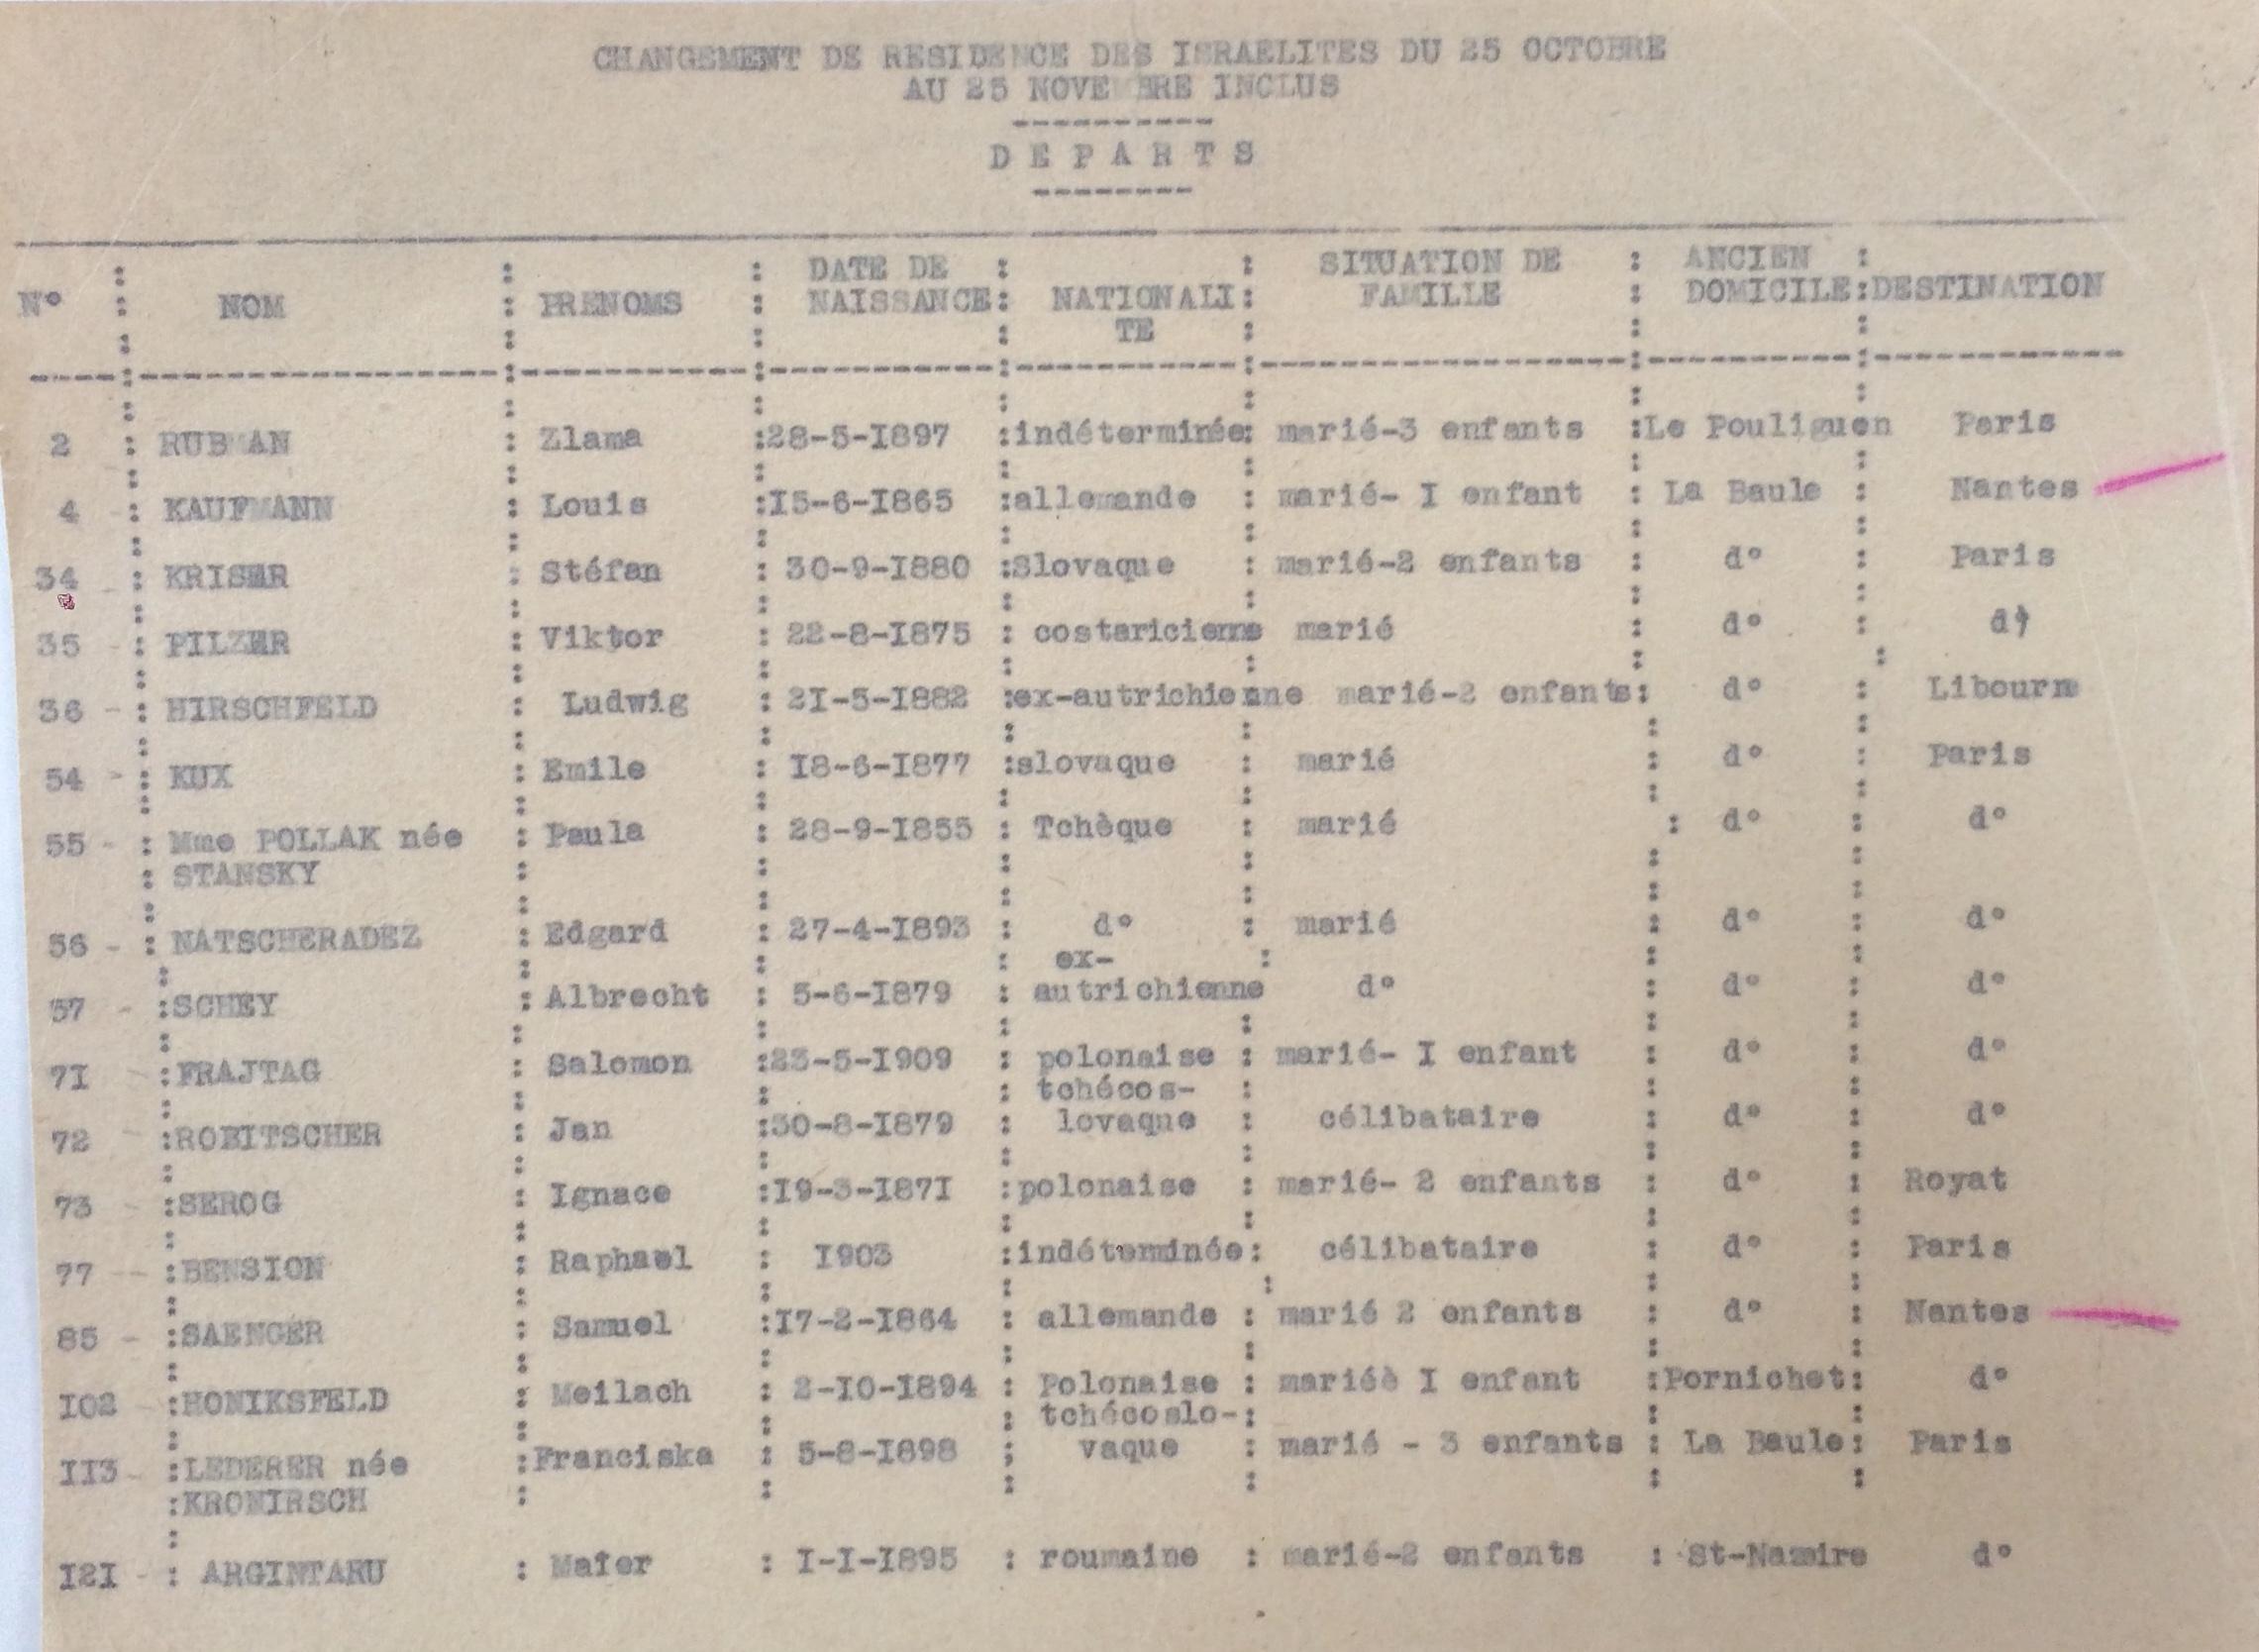 Changement de résidence des Israélites 25 octobre/25 novembre 1940 [ADLA 1694W25]